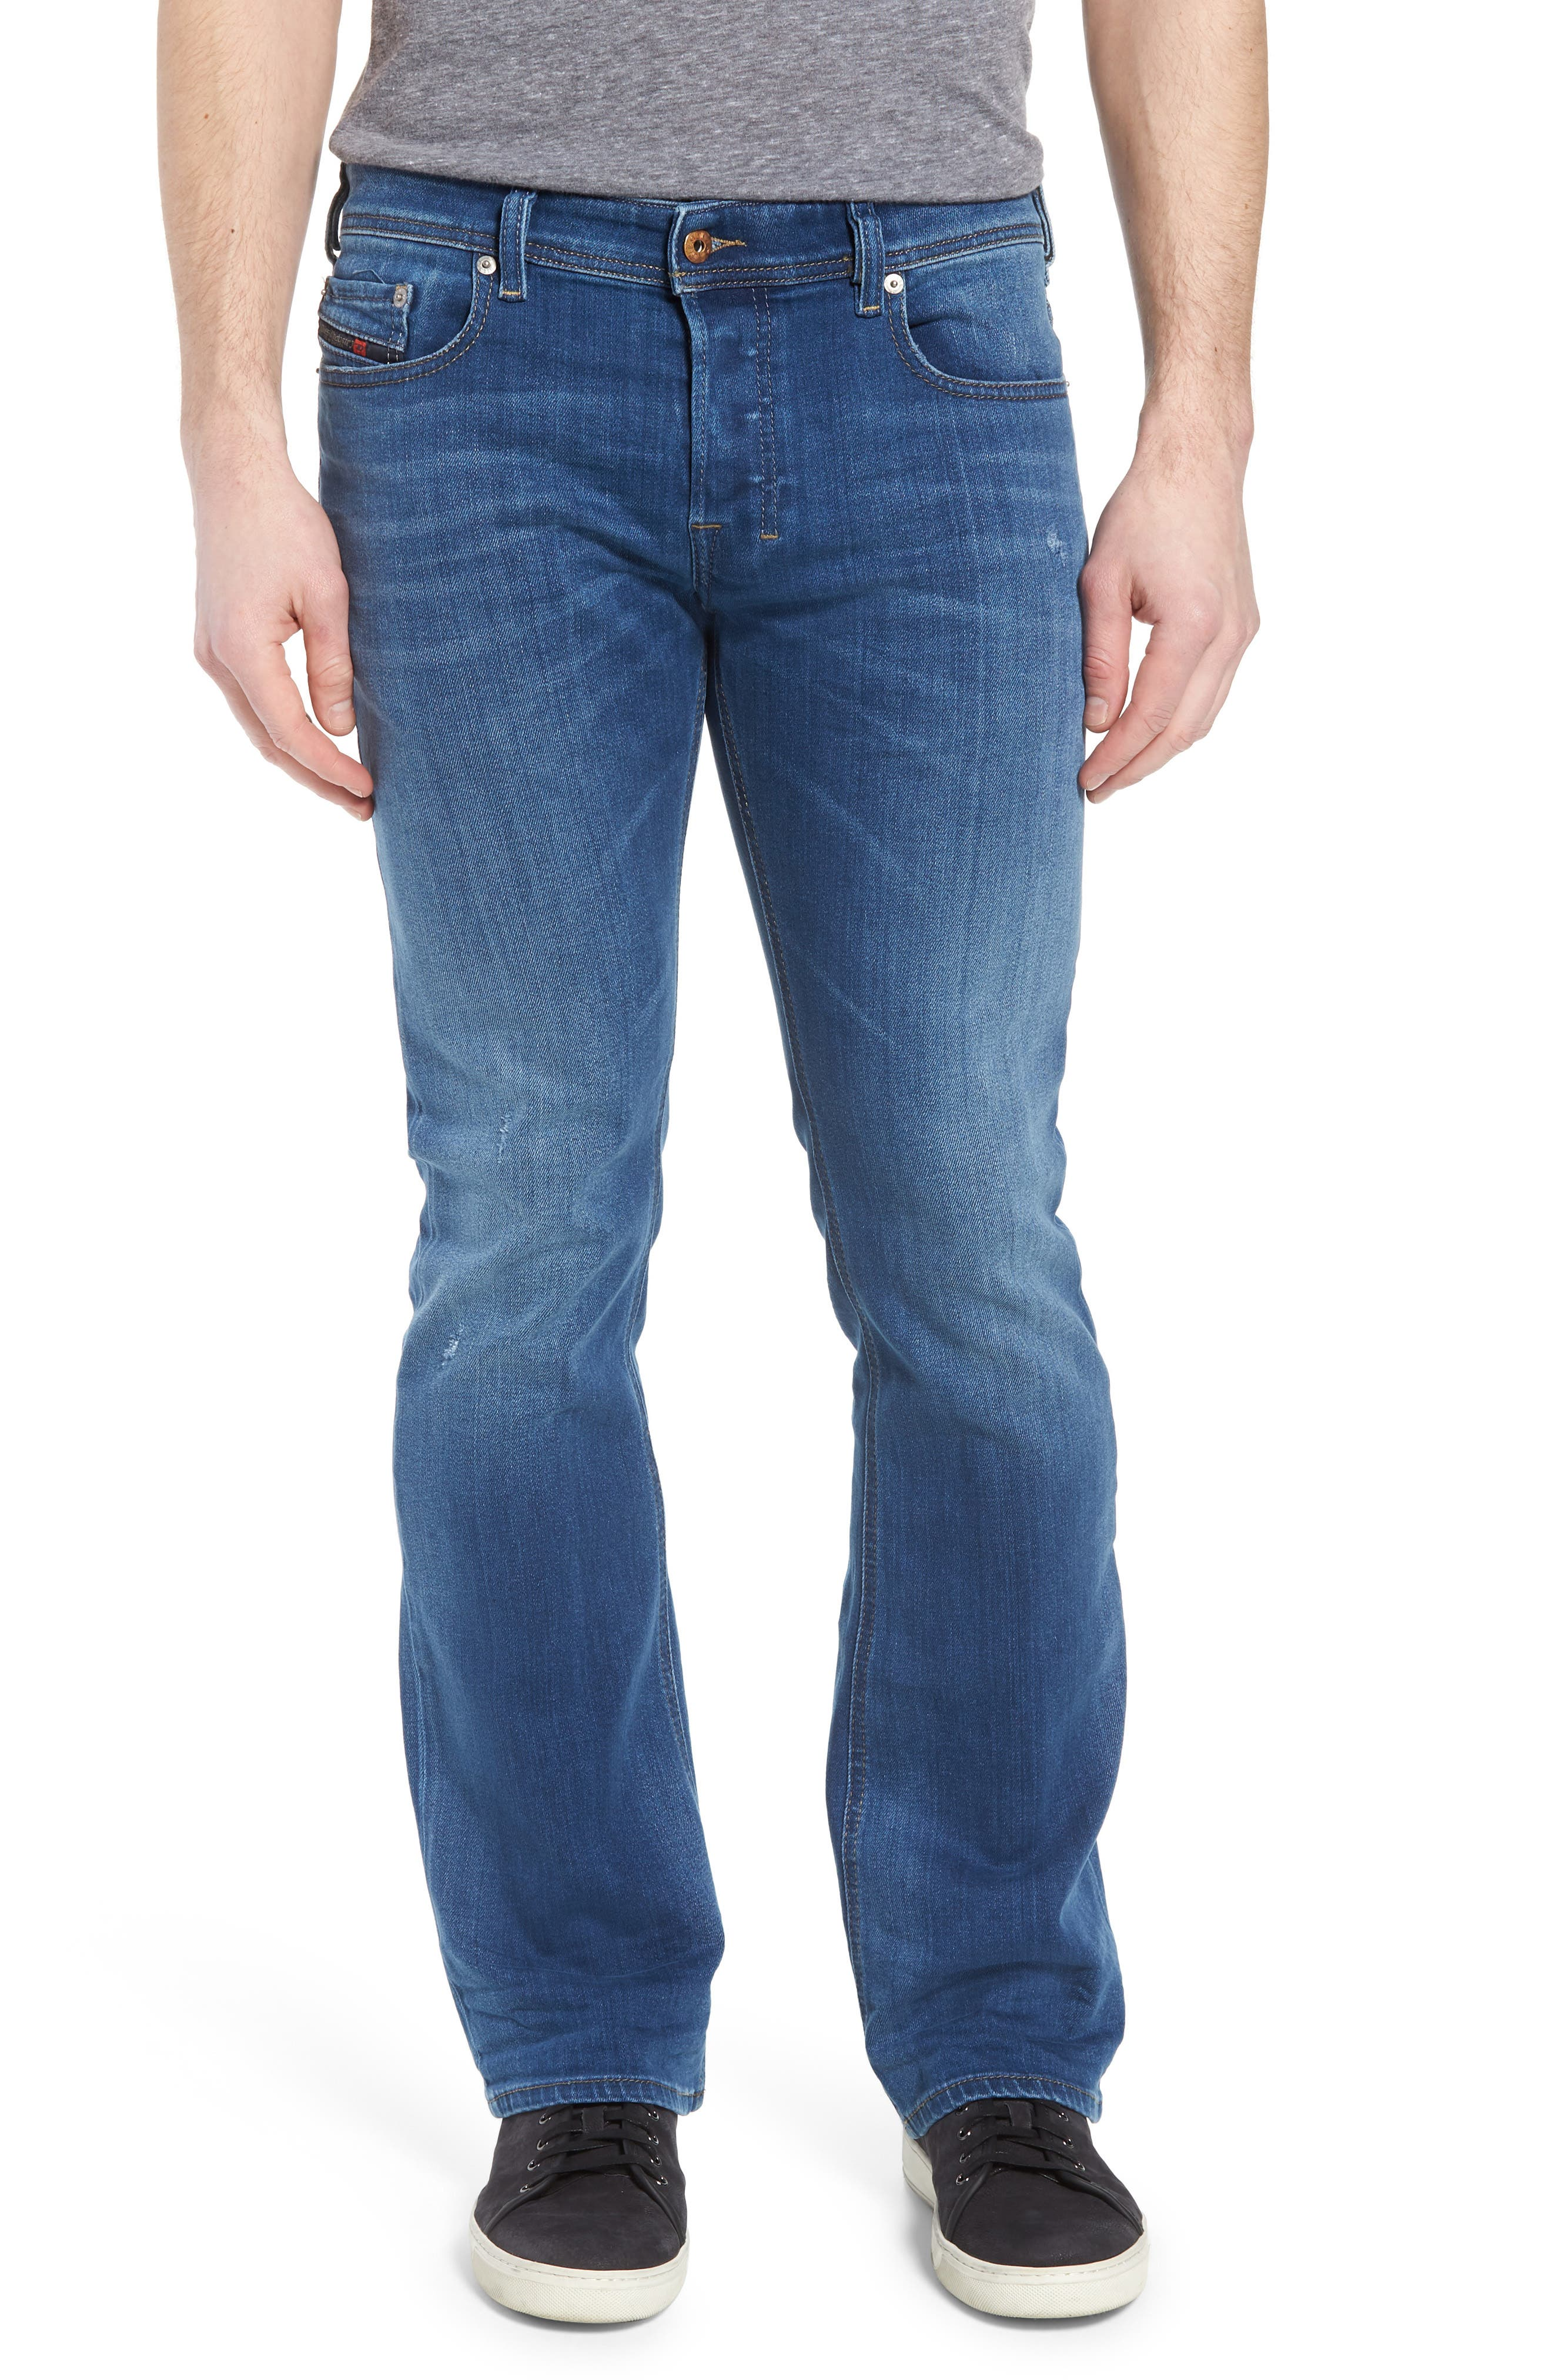 Zatiny Bootcut Jeans,                         Main,                         color, 084Qq